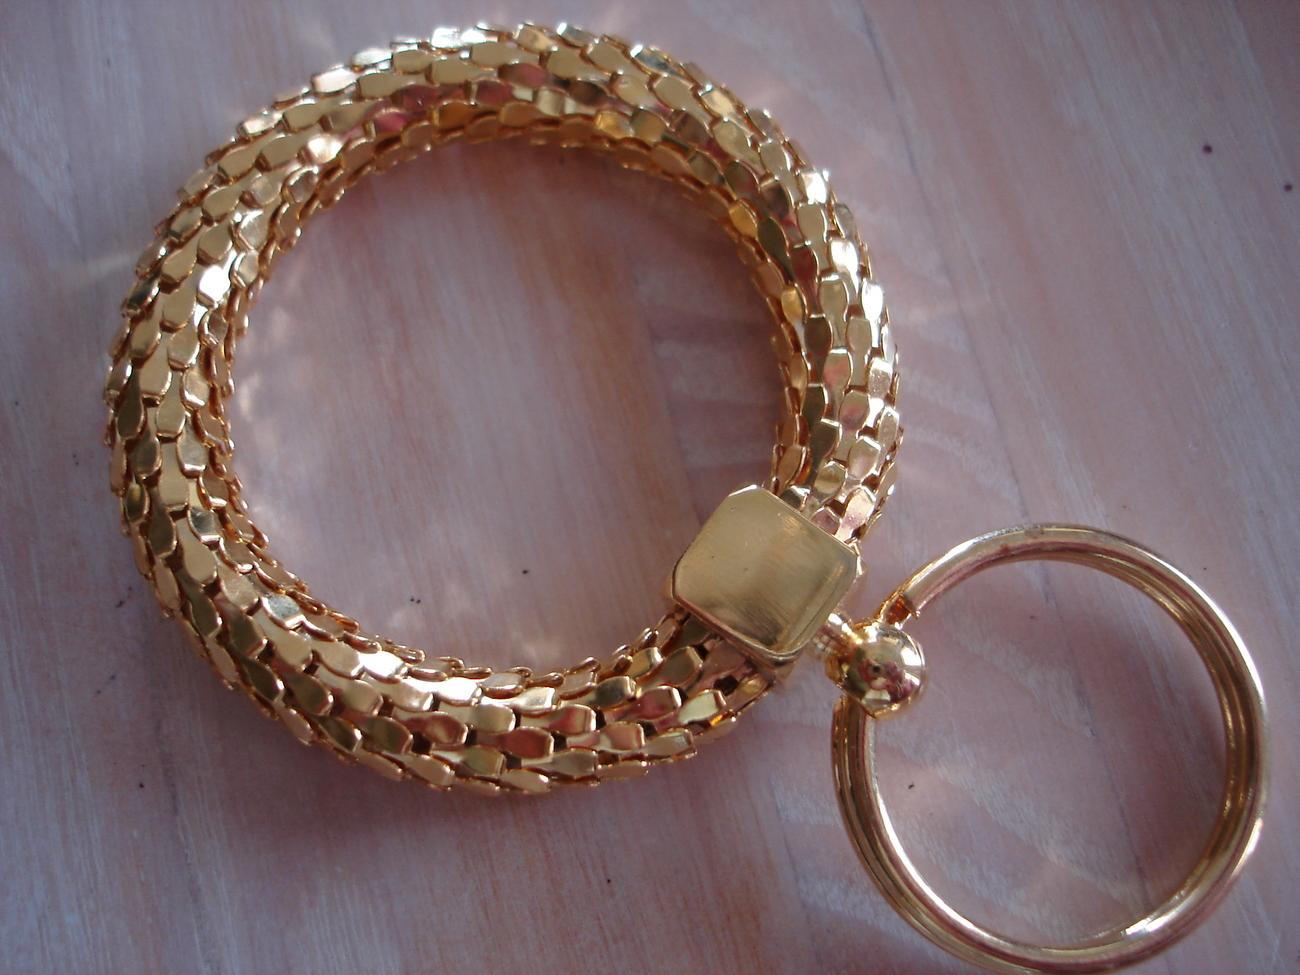 Goldtone Mesh Snakeskin Perforated Keychain Split Ring Bonanza